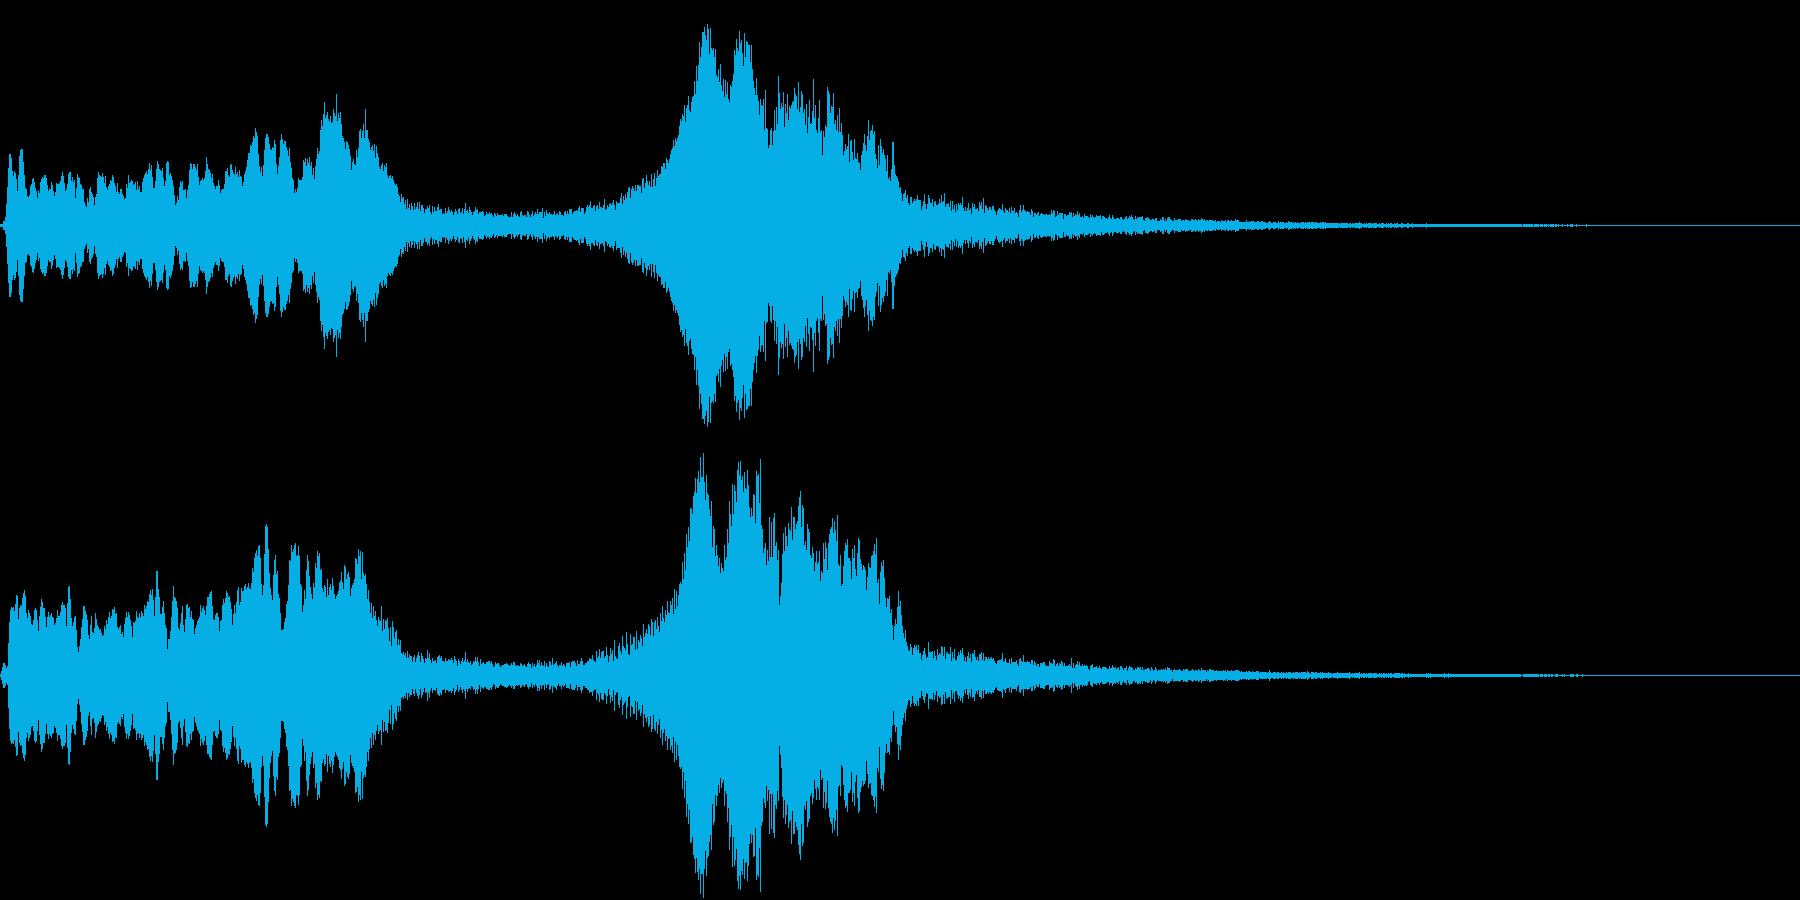 TV RADIO SFX1 アイキャッチの再生済みの波形